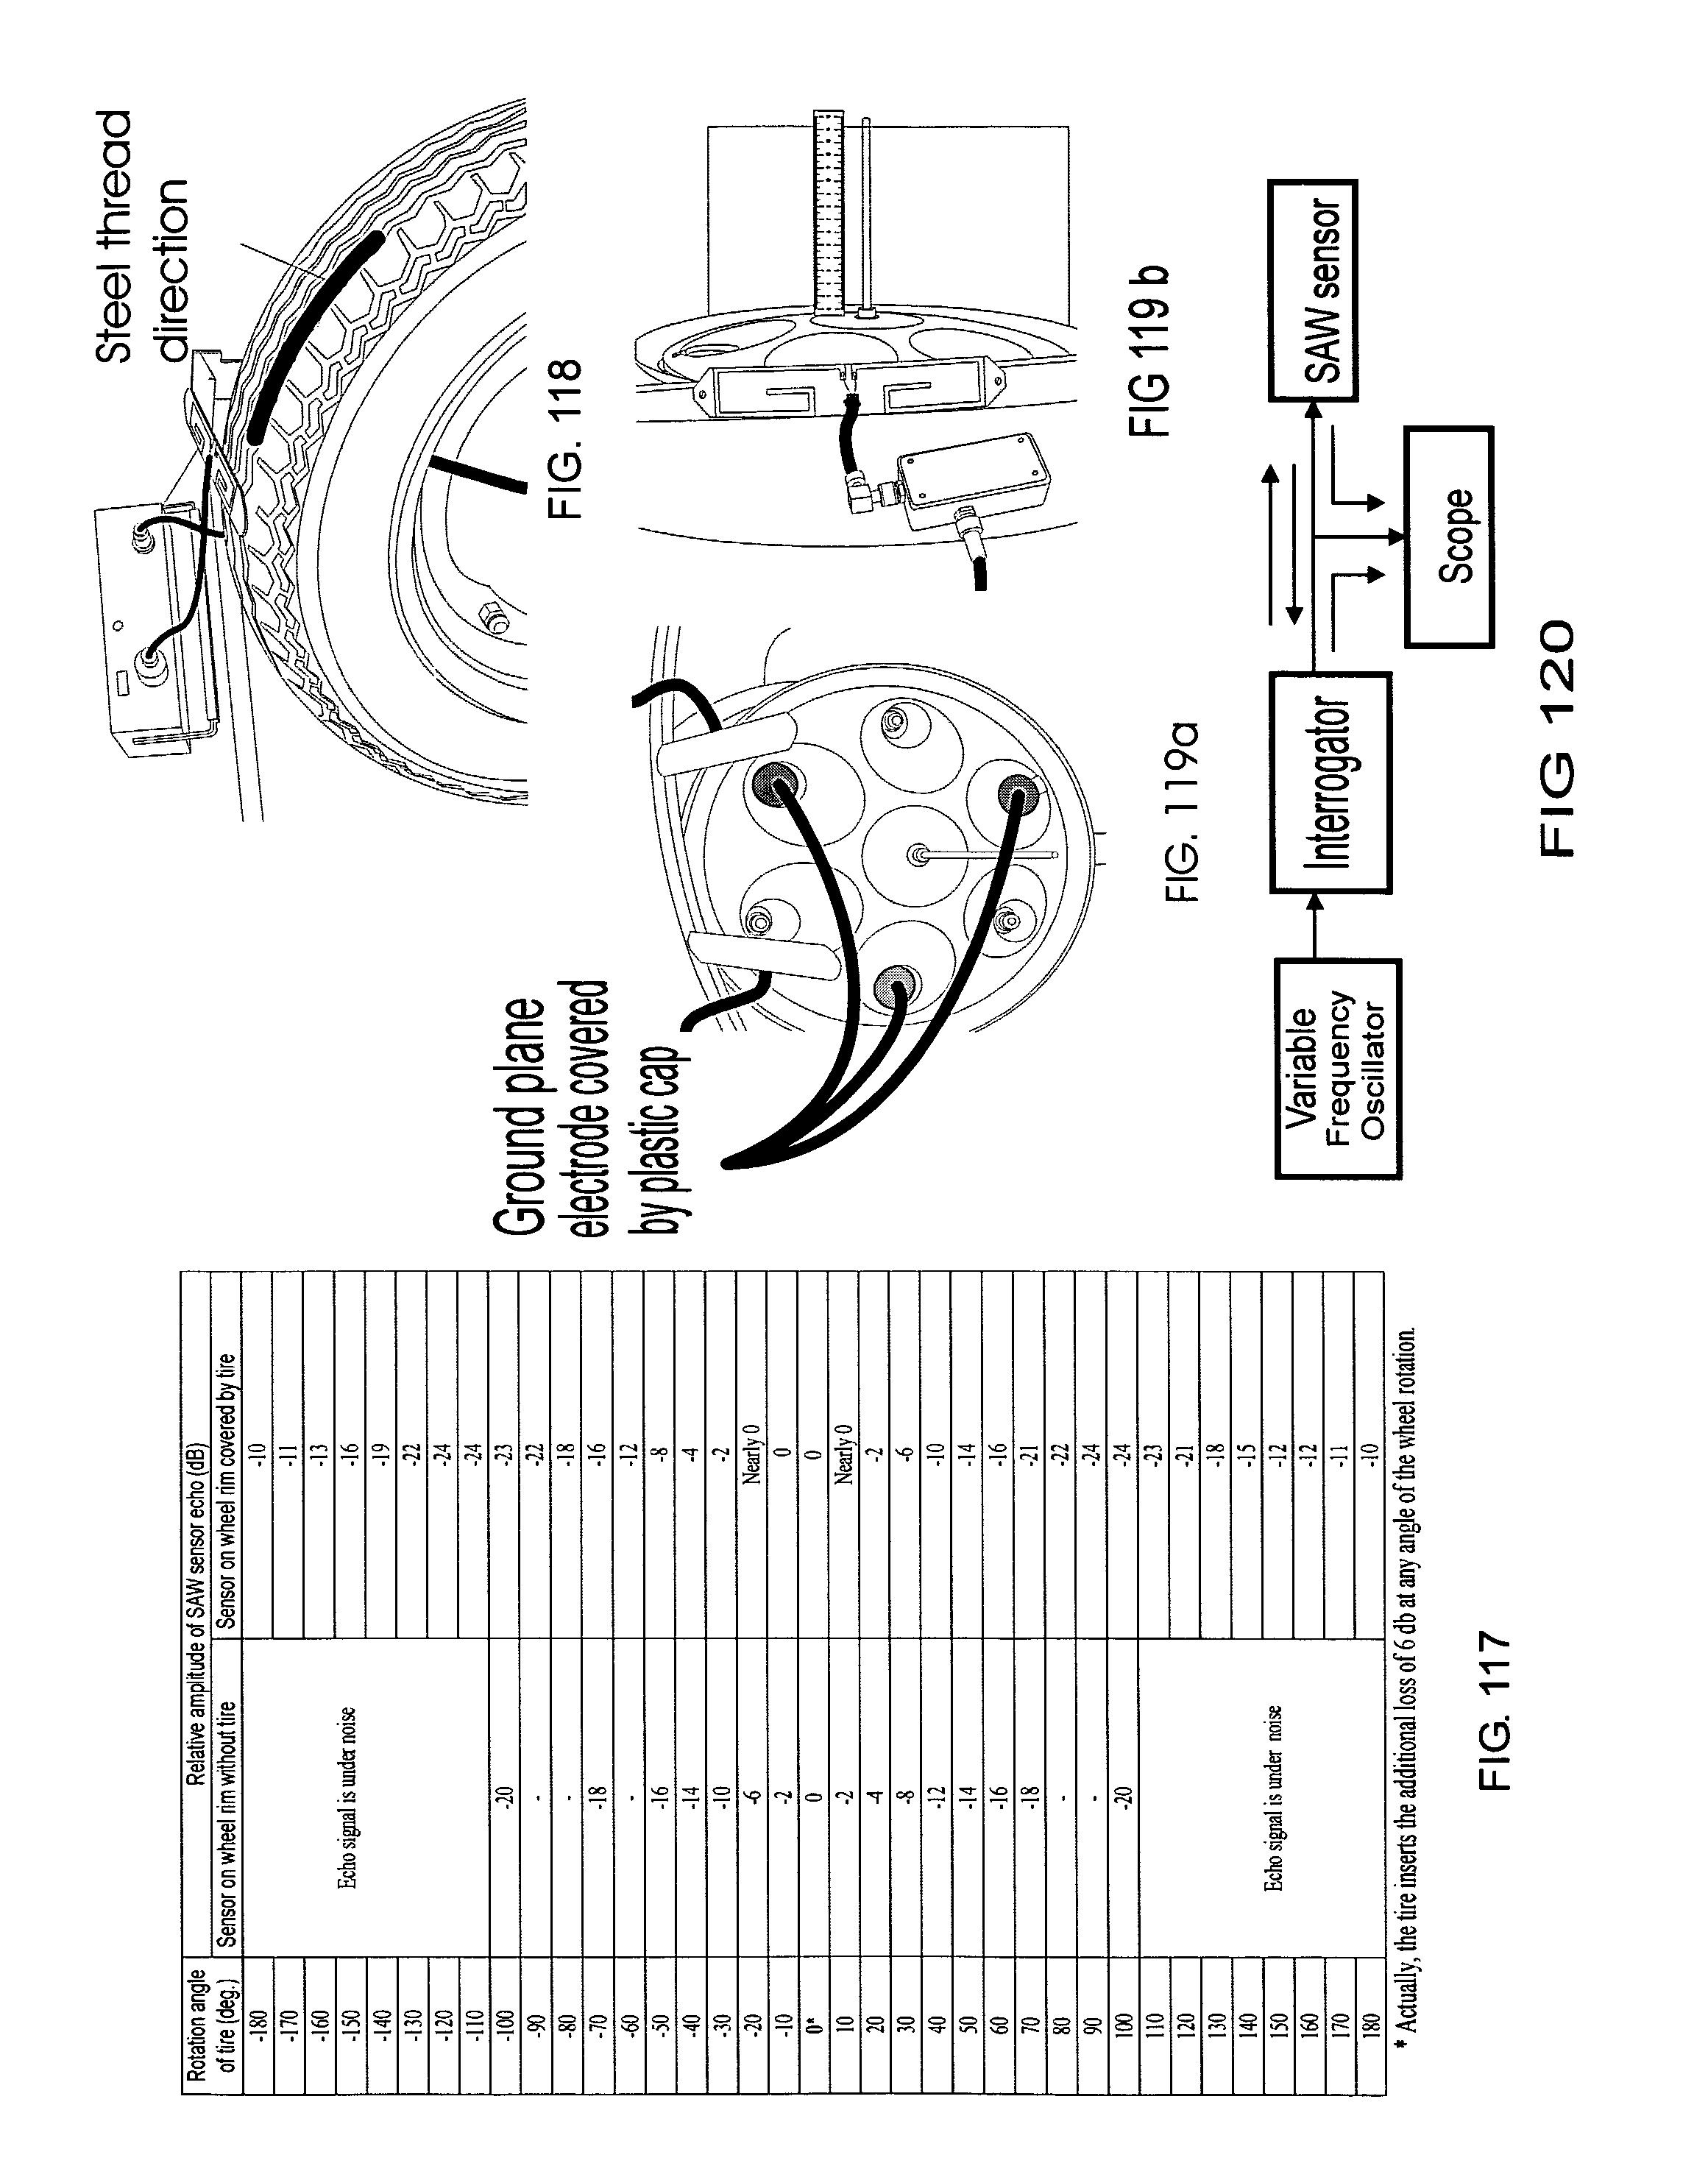 Patent Us 7421321 B2 Pic16f88 Tachometer Circuit Led And Display Indicator 0 Petitions